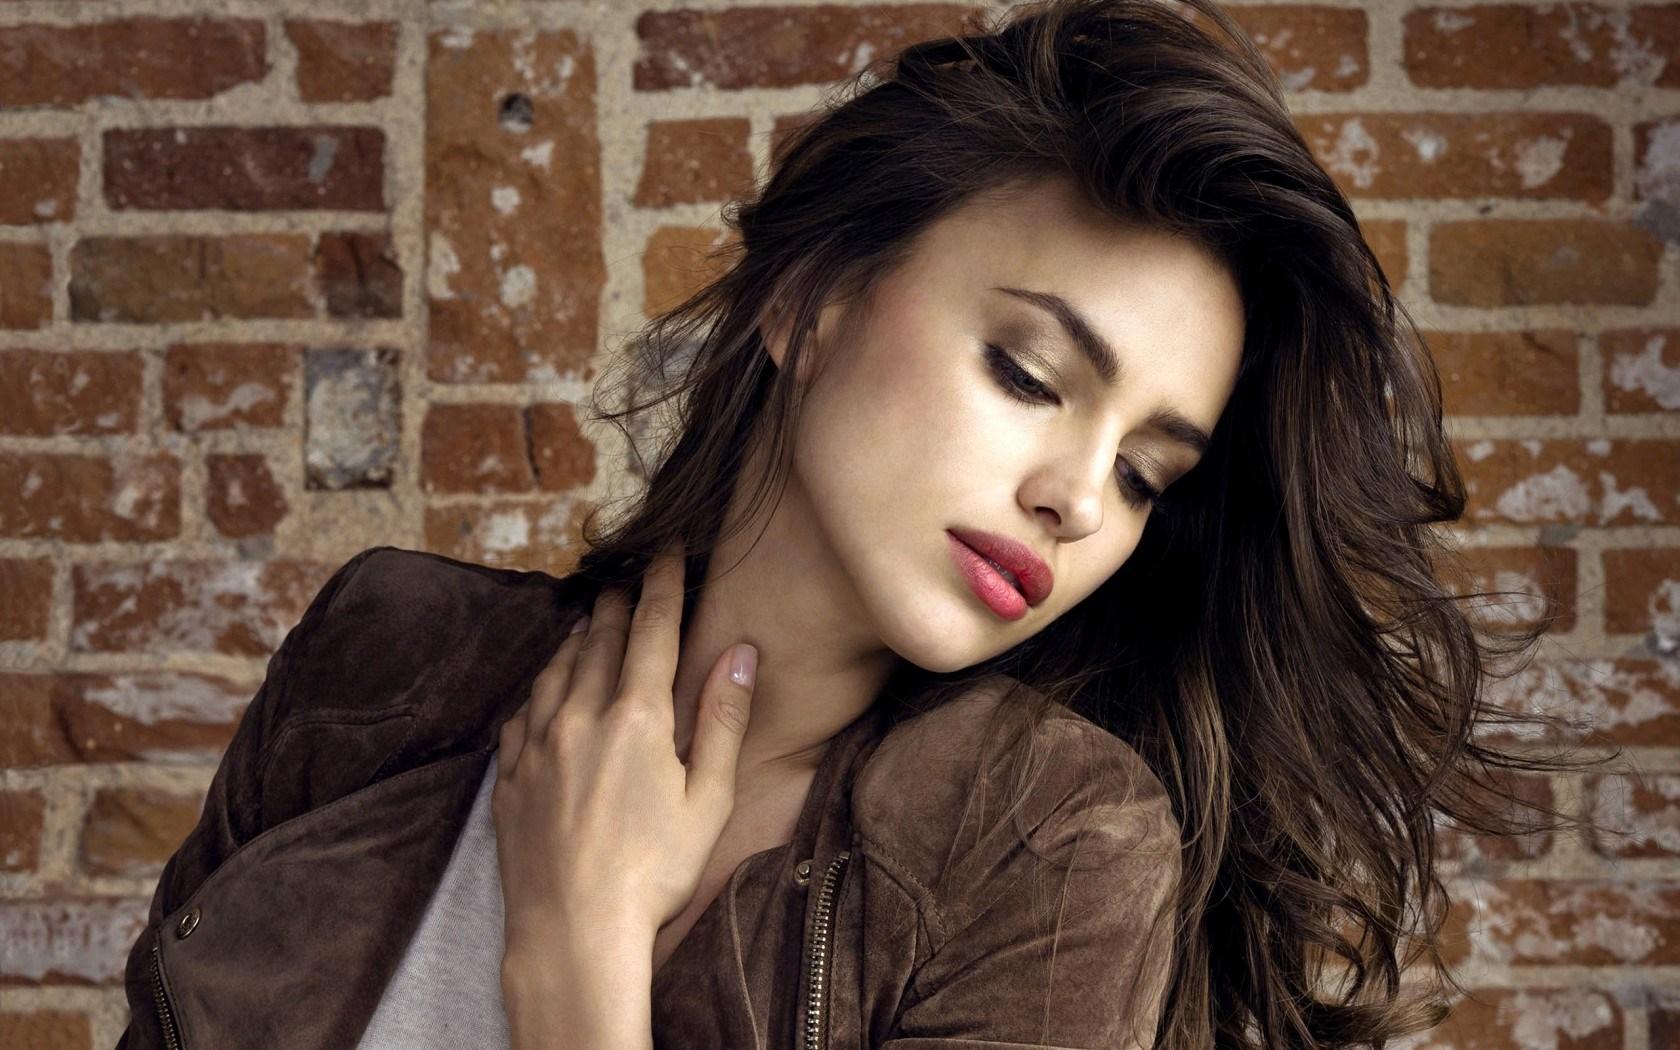 Irina Shayk Model Girl wallpaper Gallery 1680x1050